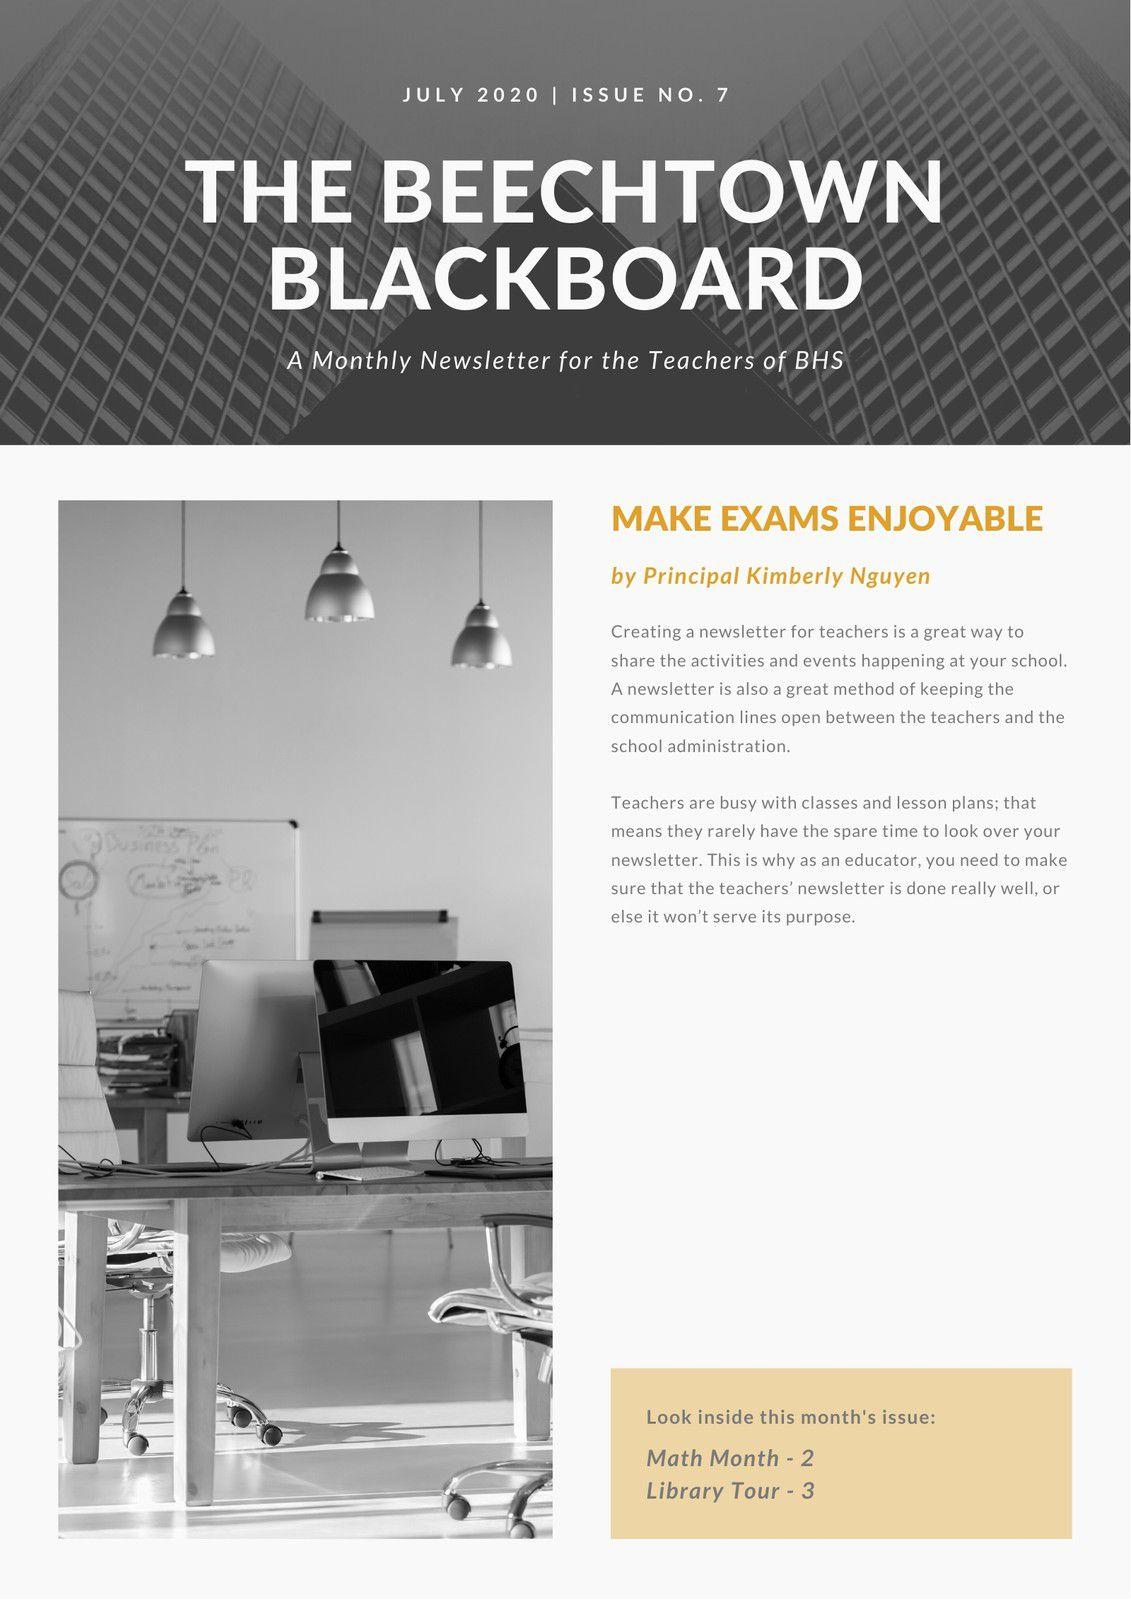 002 Imposing Newsletter Template For Teacher High Resolution  Teachers To Parent Printable Free SchoolFull